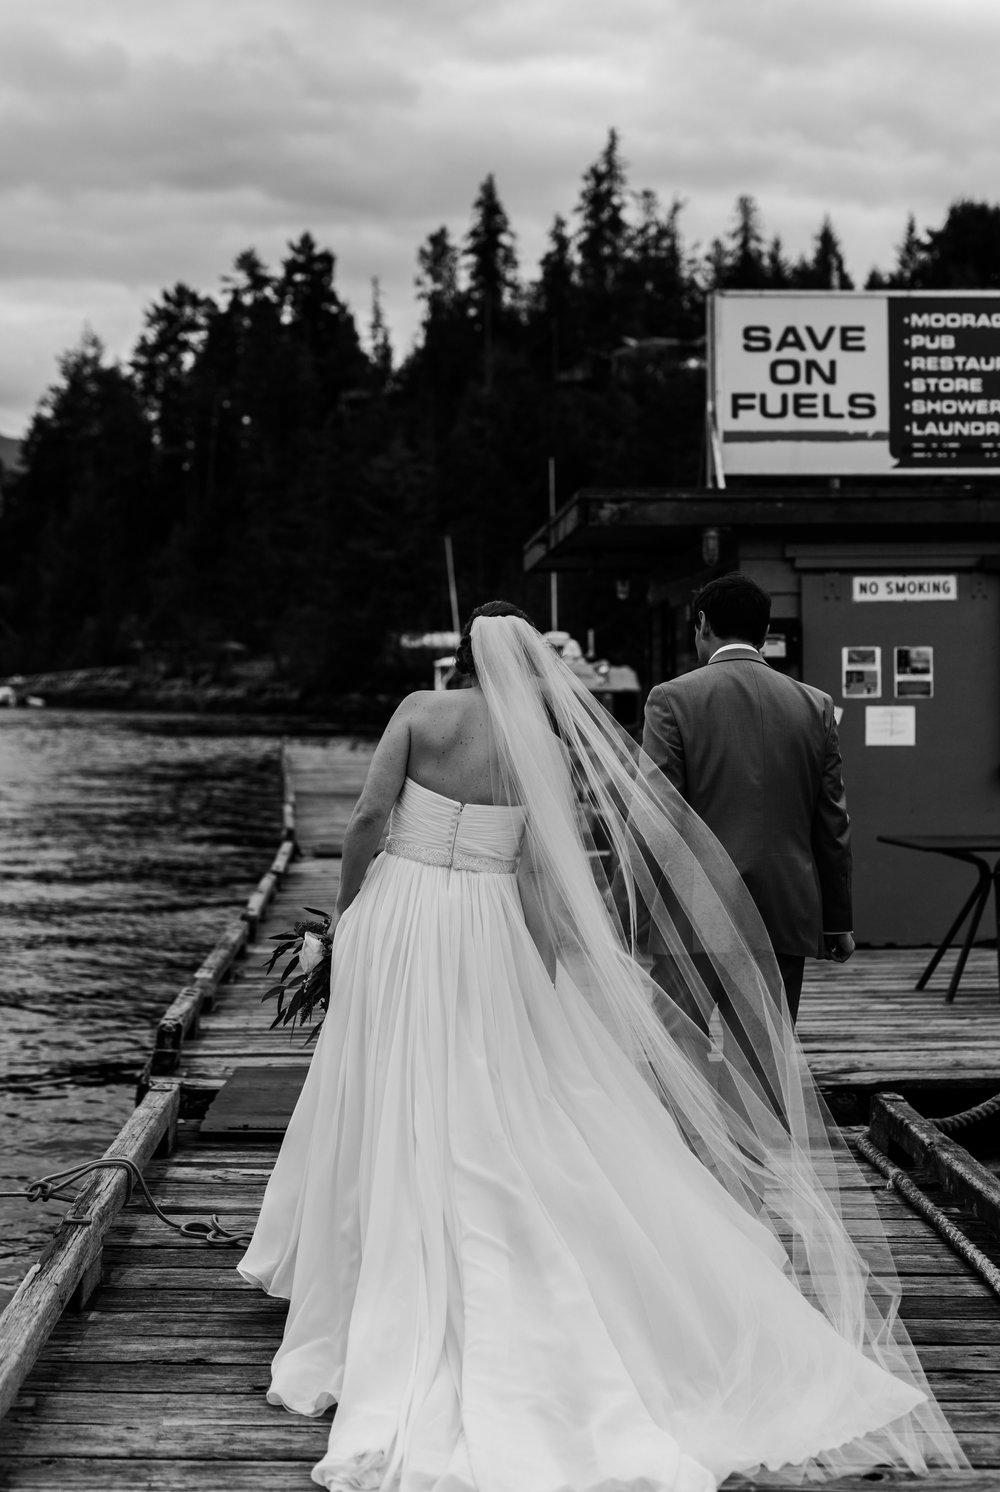 West Coast Wilderness Lodge Wedding Photos - Vancouver Wedding Photographer & Videographer - Sunshine Coast Wedding Photos - Sunshine Coast Wedding Photographer - Jennifer Picard Photography - IMG_6737.jpg